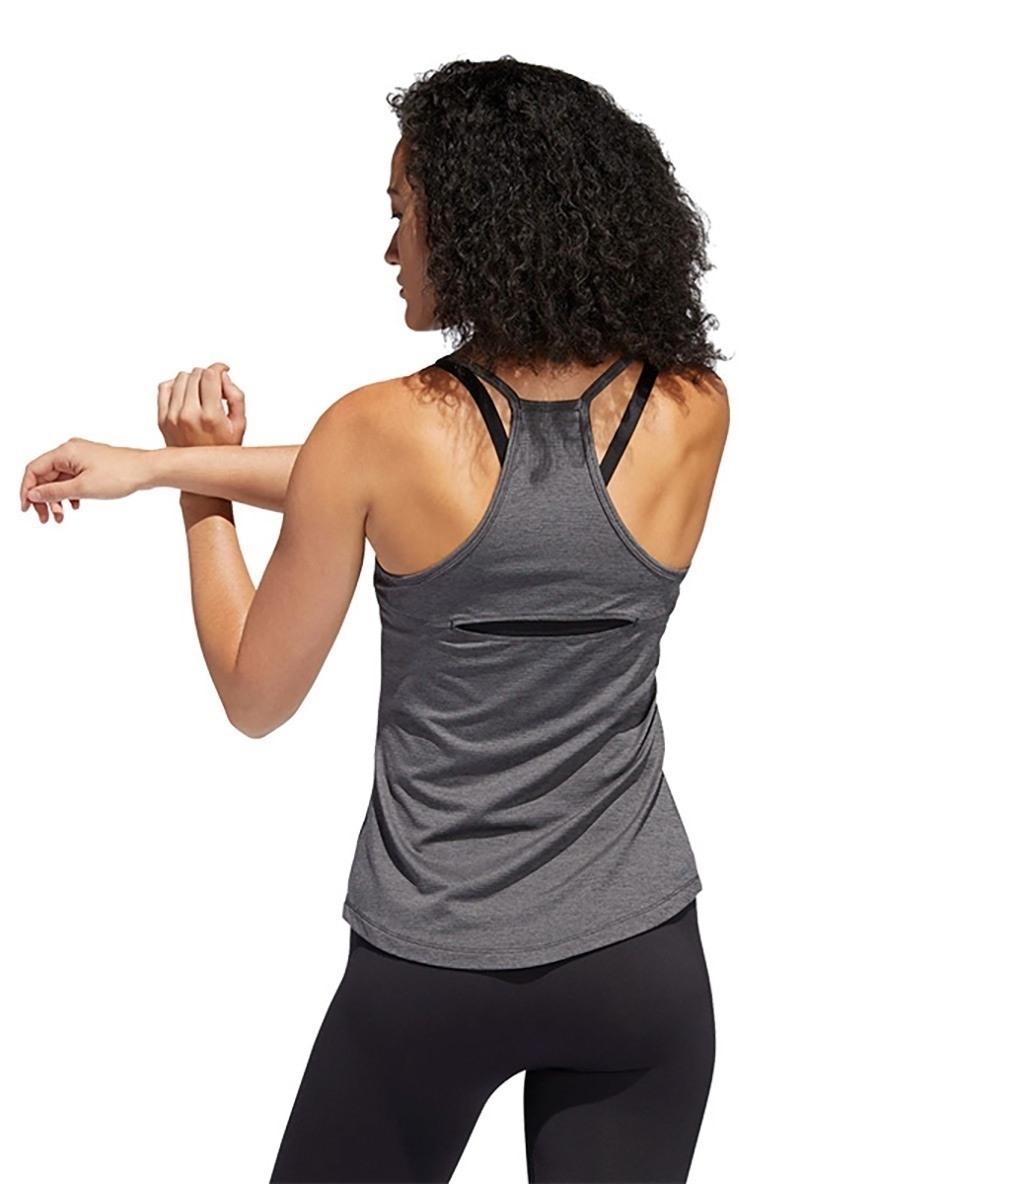 Adidas Regata Performance Atlet Siyah